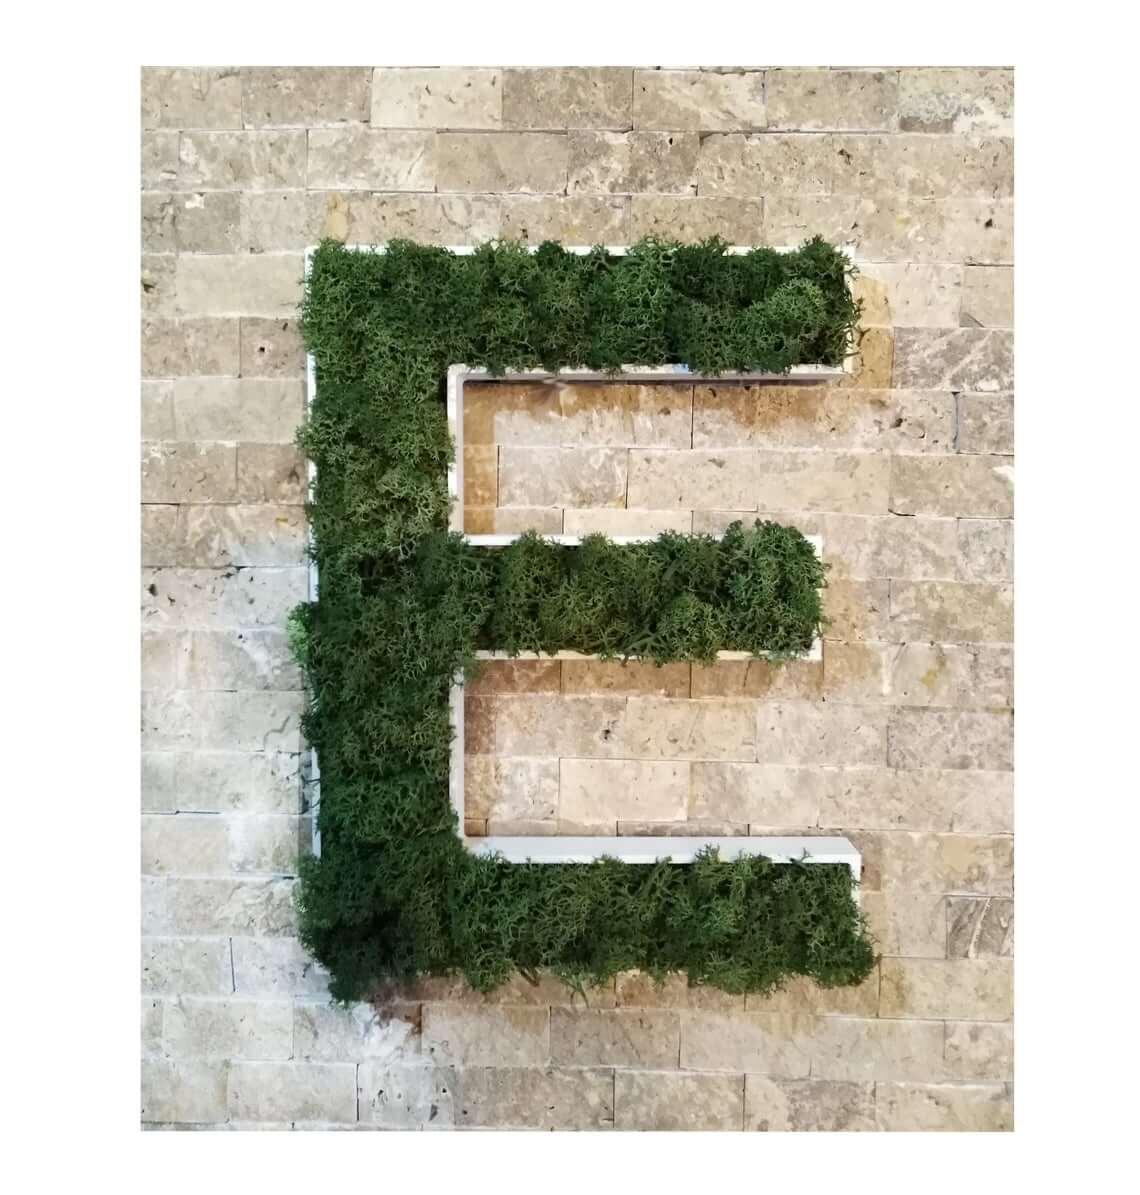 Custom Moss Covered Wall Piece